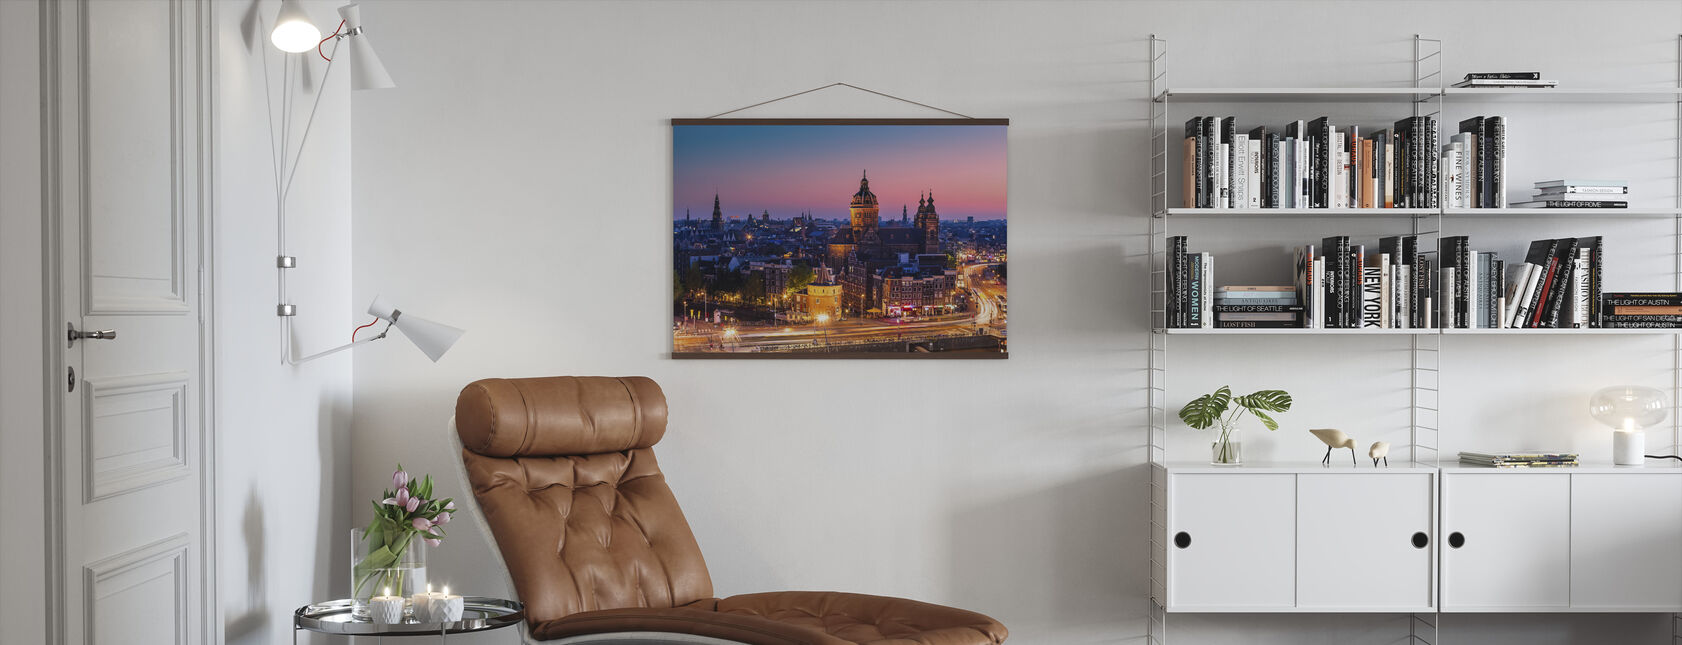 Amsterdam City - Poster - Living Room